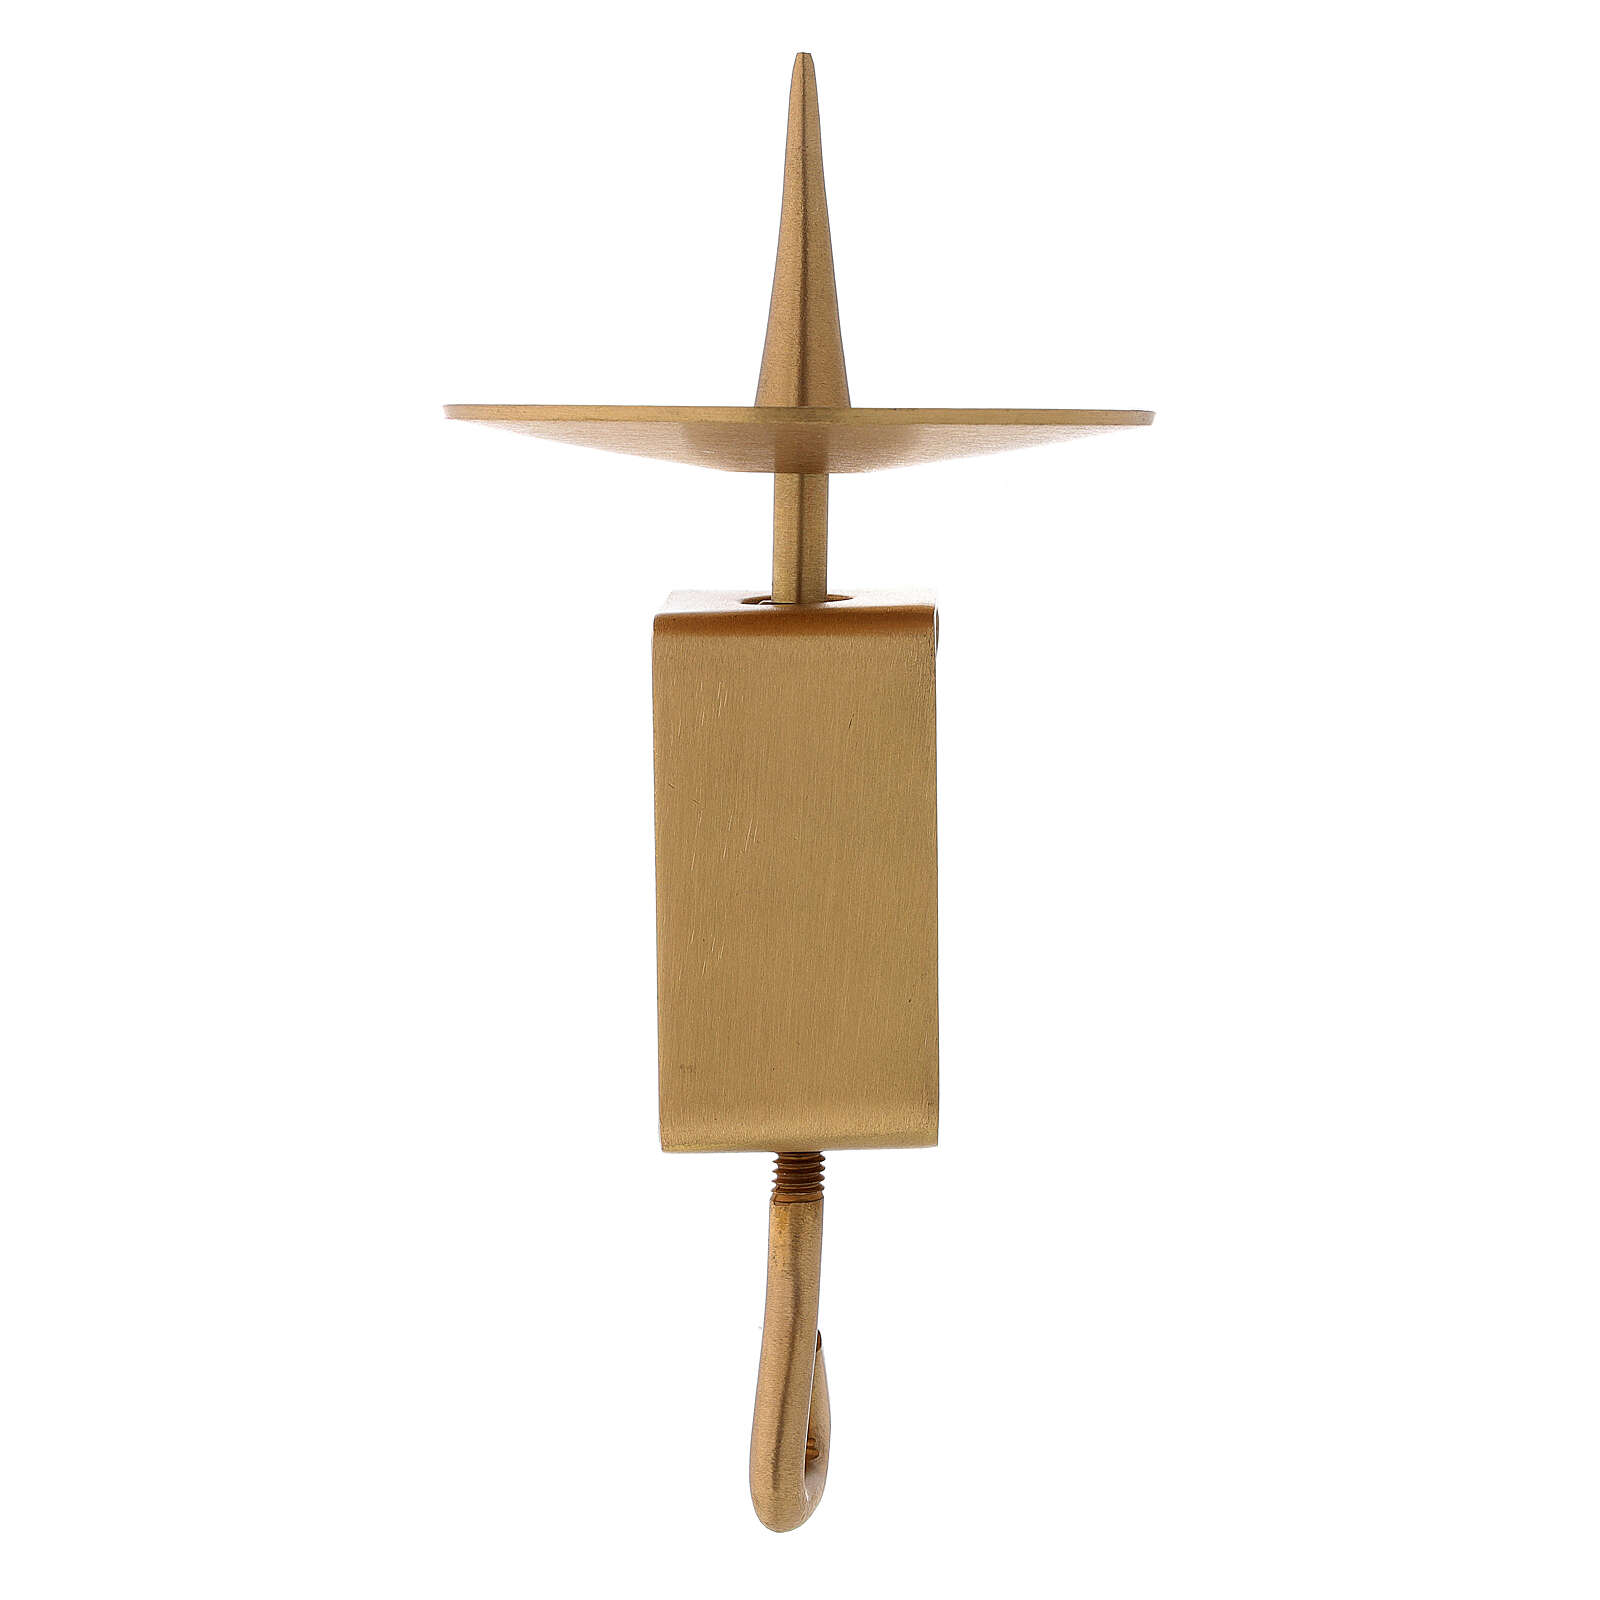 Portacandela regolabile ottone satinato dorato 10 cm 4